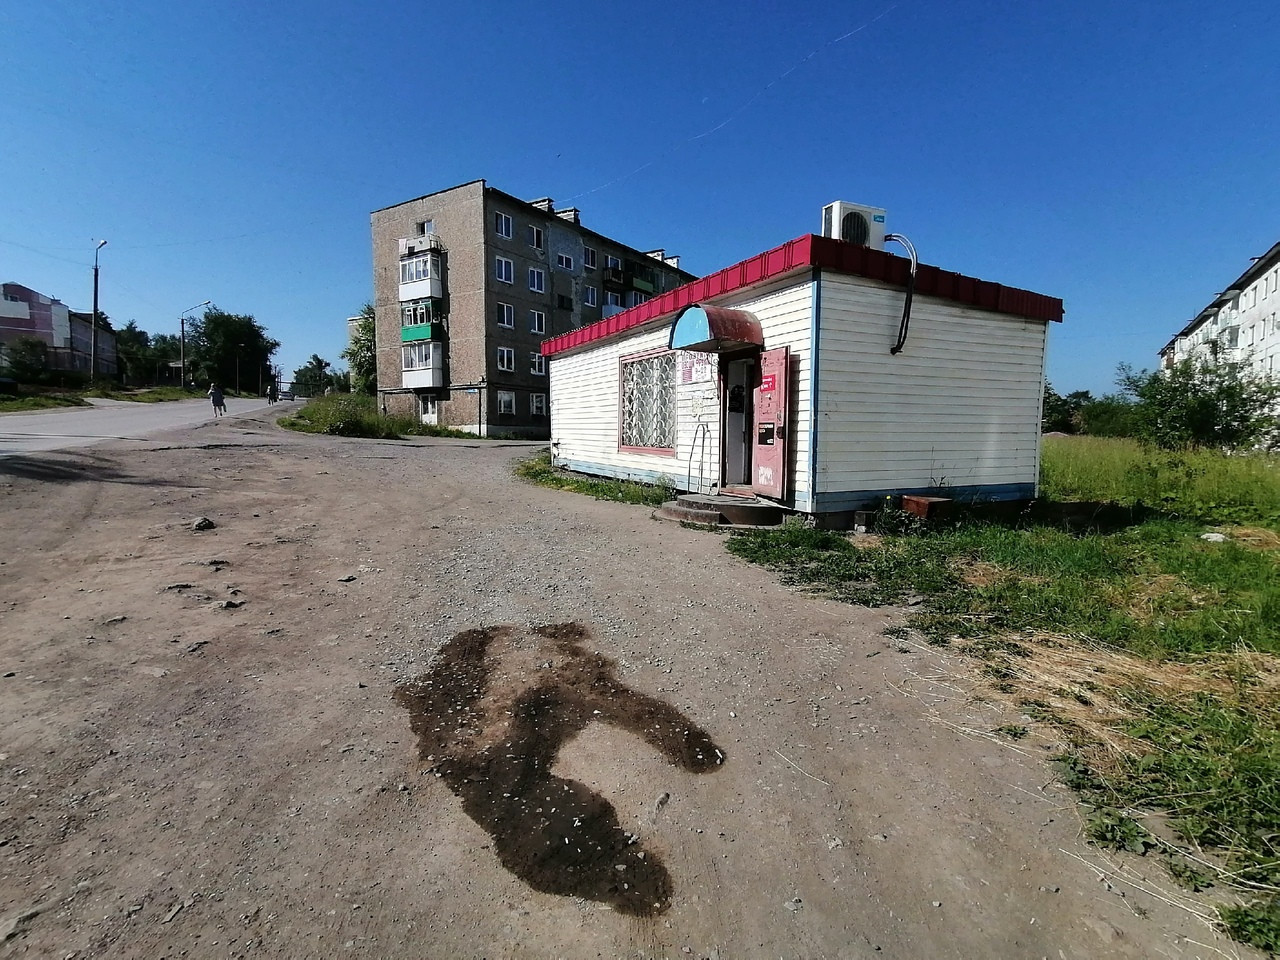 Место трагедии: здесь нет тротуара, девушки шли по обочине